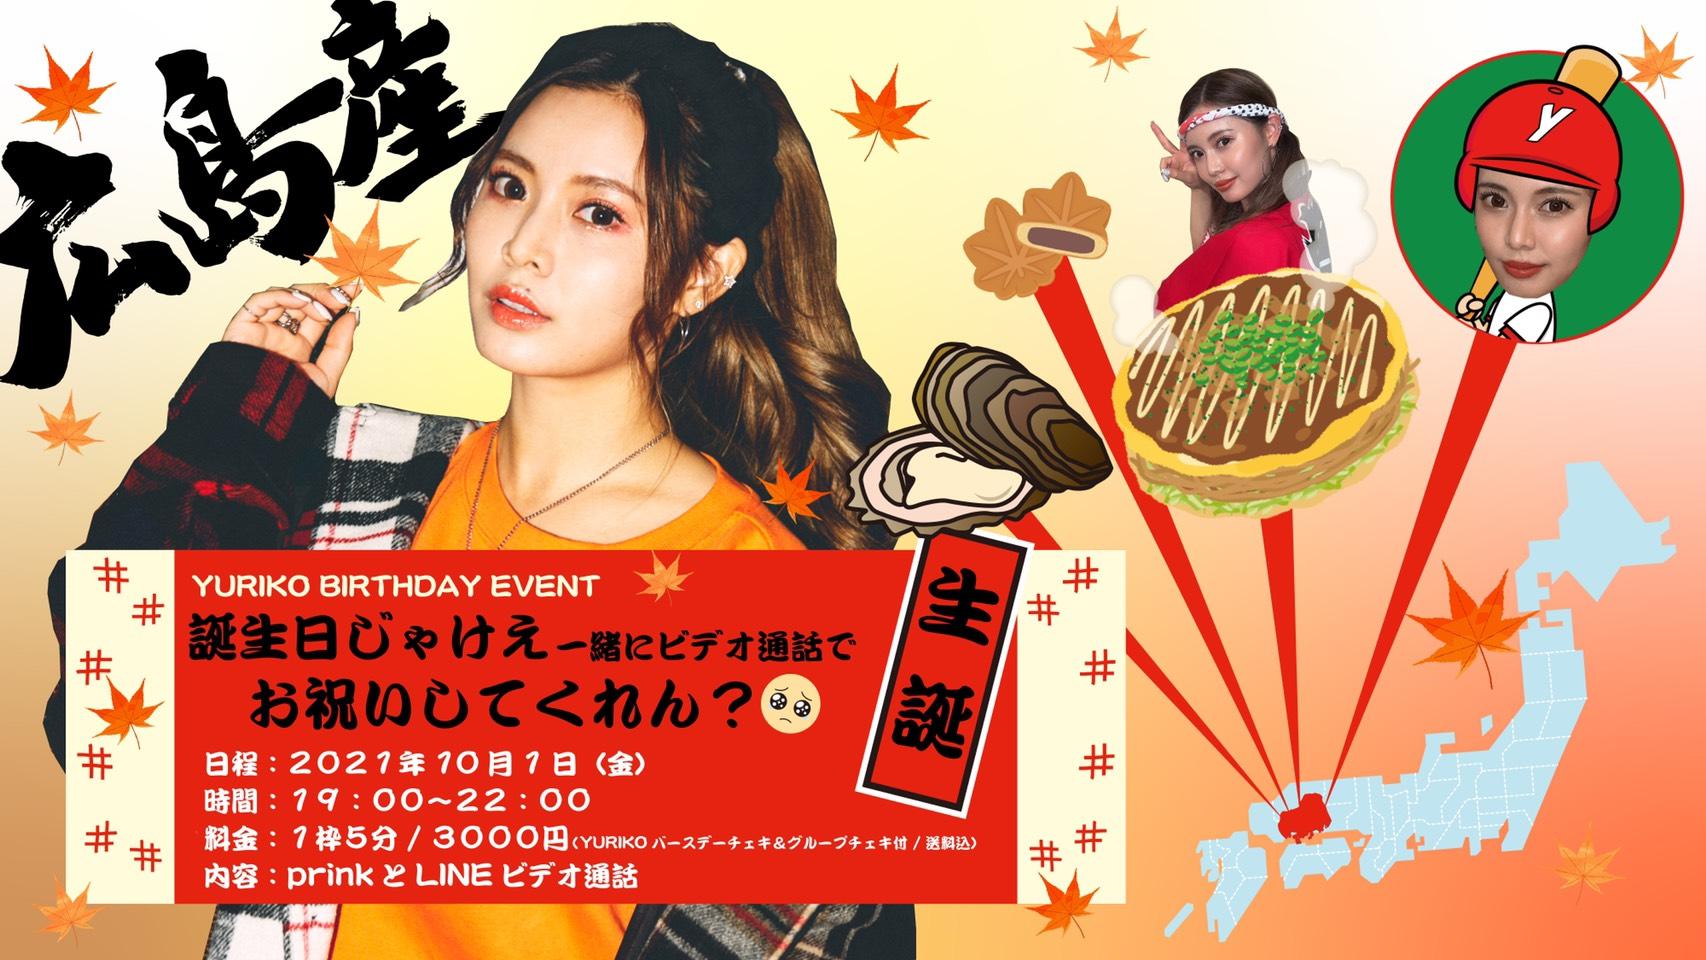 【BDイベント】YURIKO BirthDay Event~誕生日じゃけえ 一緒にビデオ通話でお祝いしてくれん?~(スペシャル・チェキ 2種付)